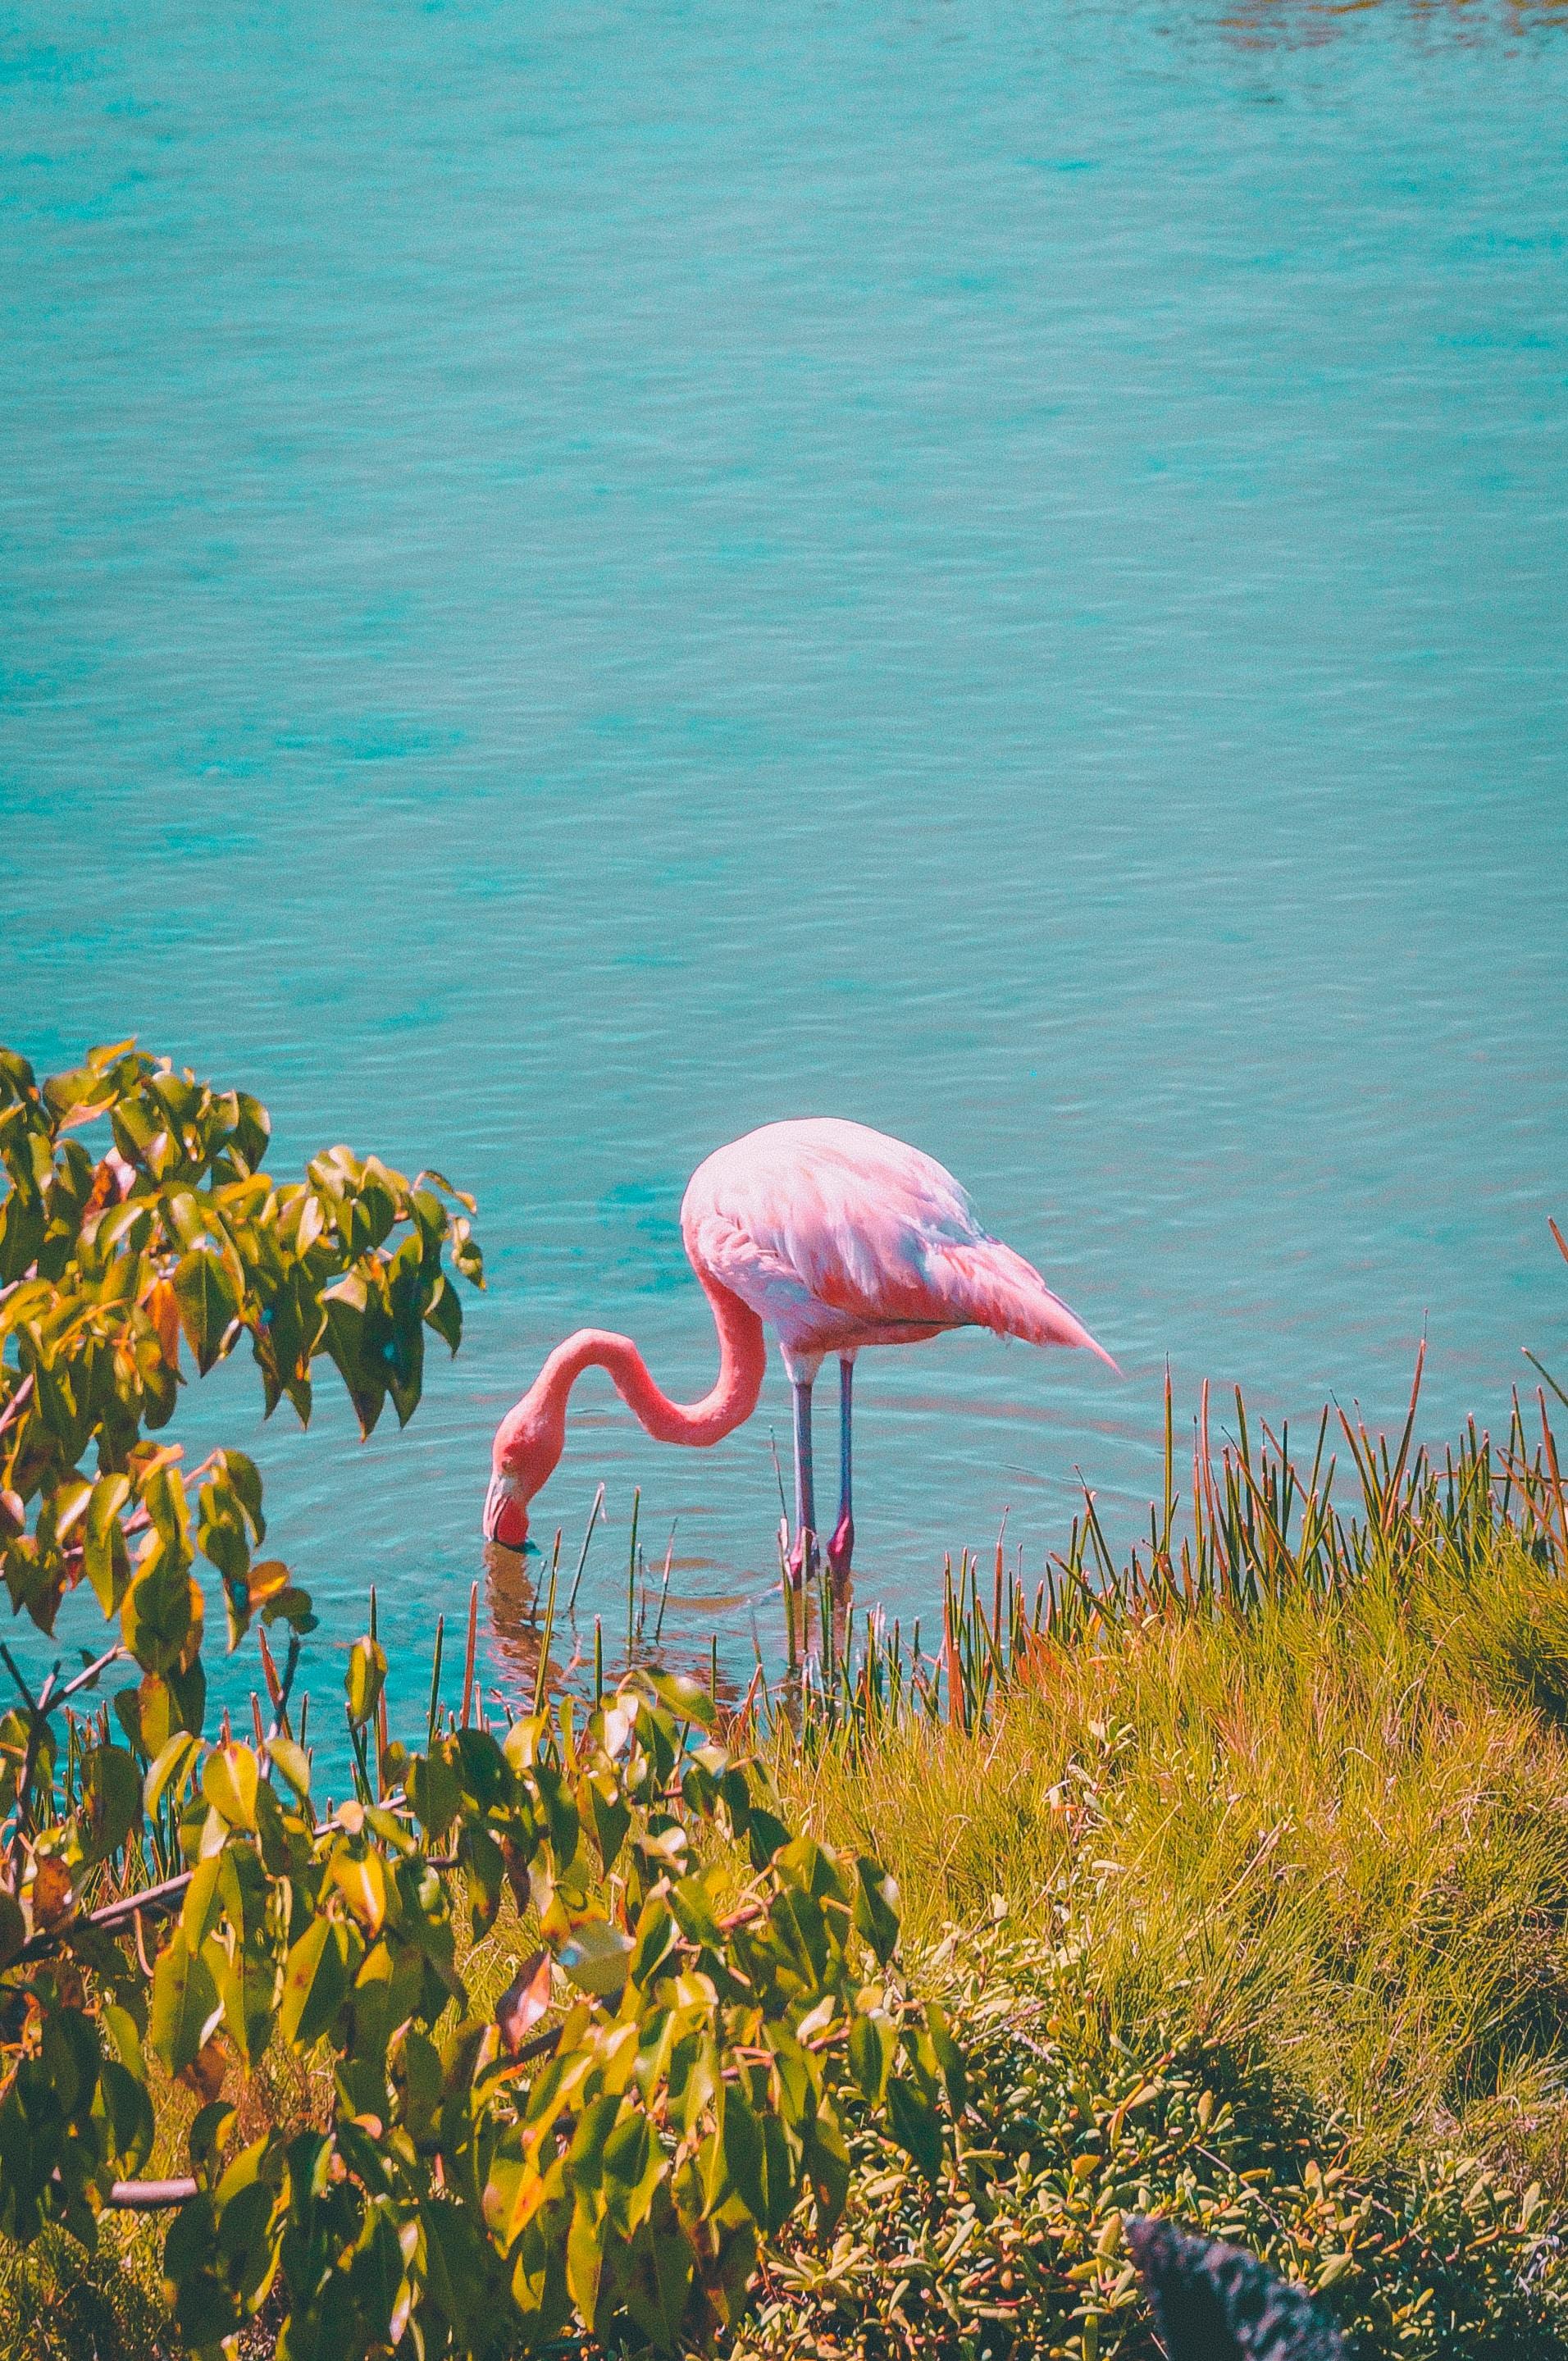 pink flamingo near grass field